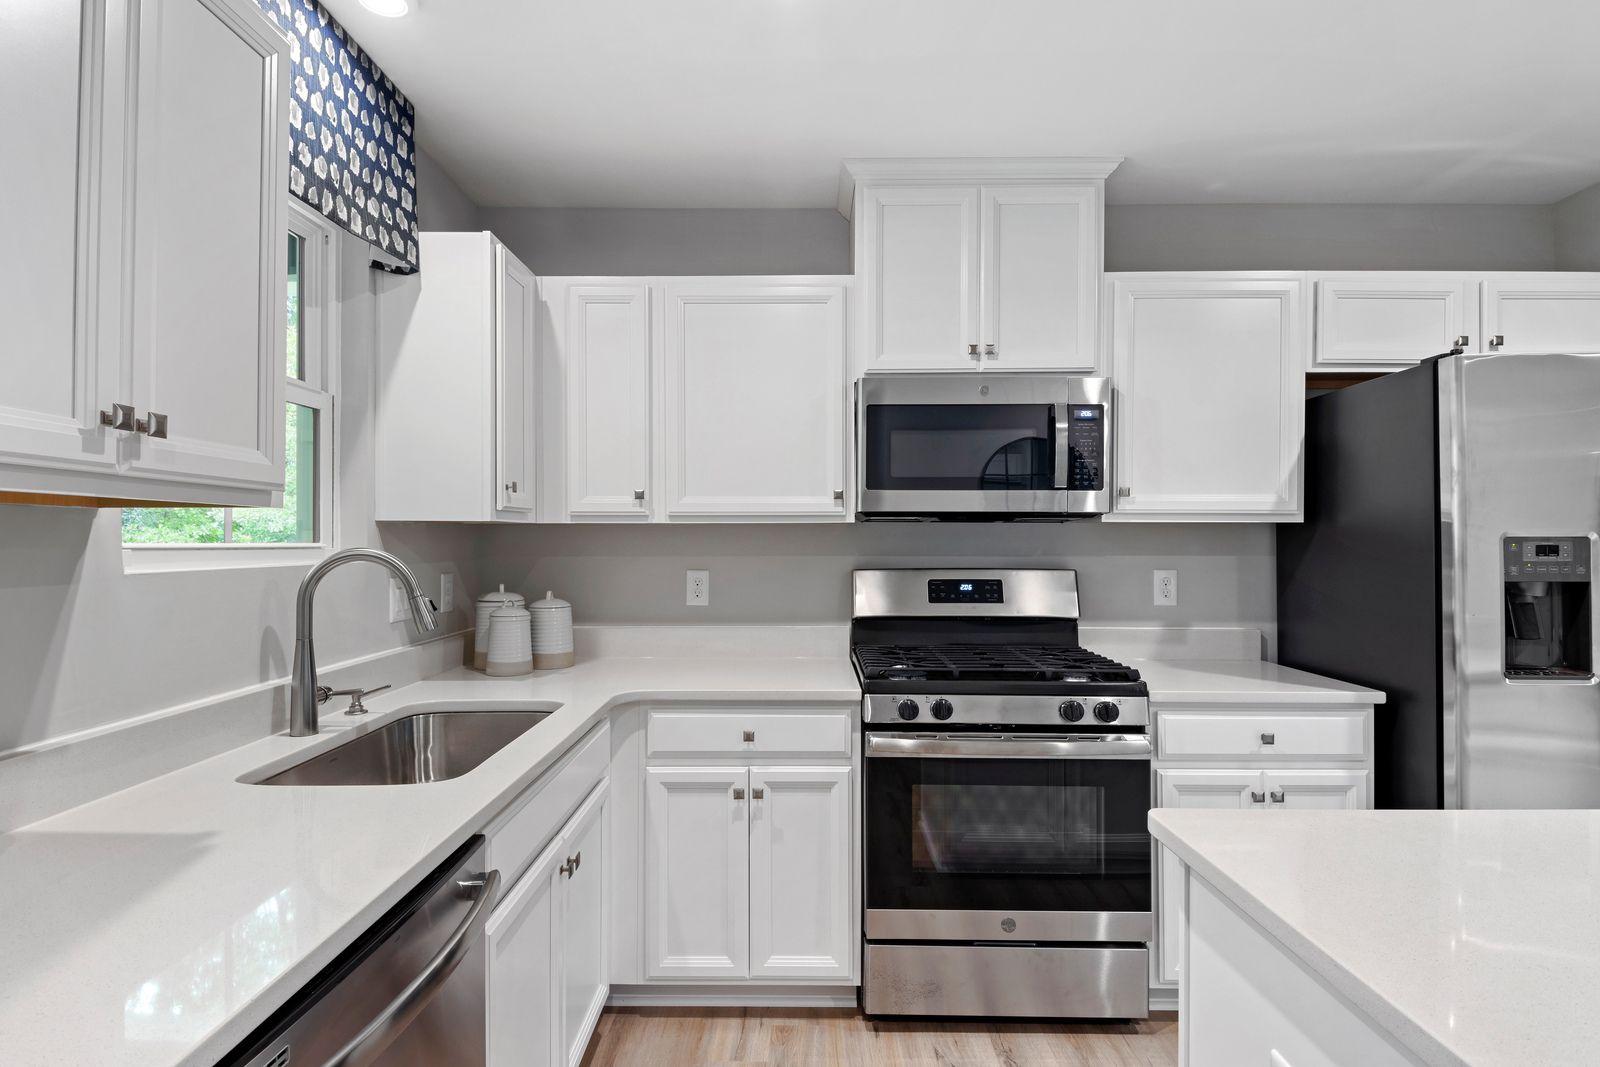 Kitchen featured in the Nassau By Ryan Homes in Greenville-Spartanburg, SC